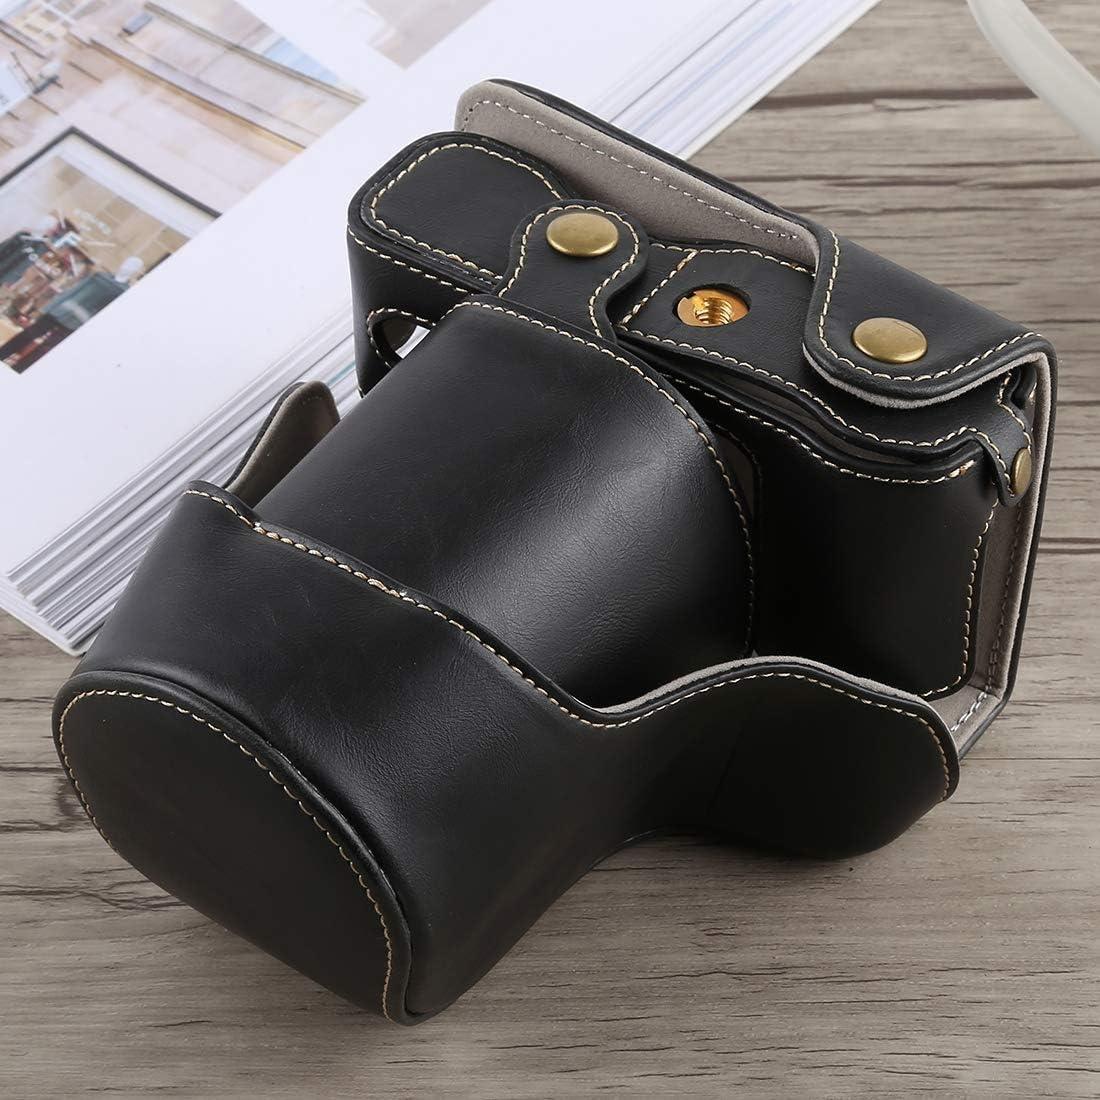 Xdashou Camera Bag Wuzpx Total Body Camera PU Leather Case Bag with Strap for Fujifilm X-A5 Black Color : Brown